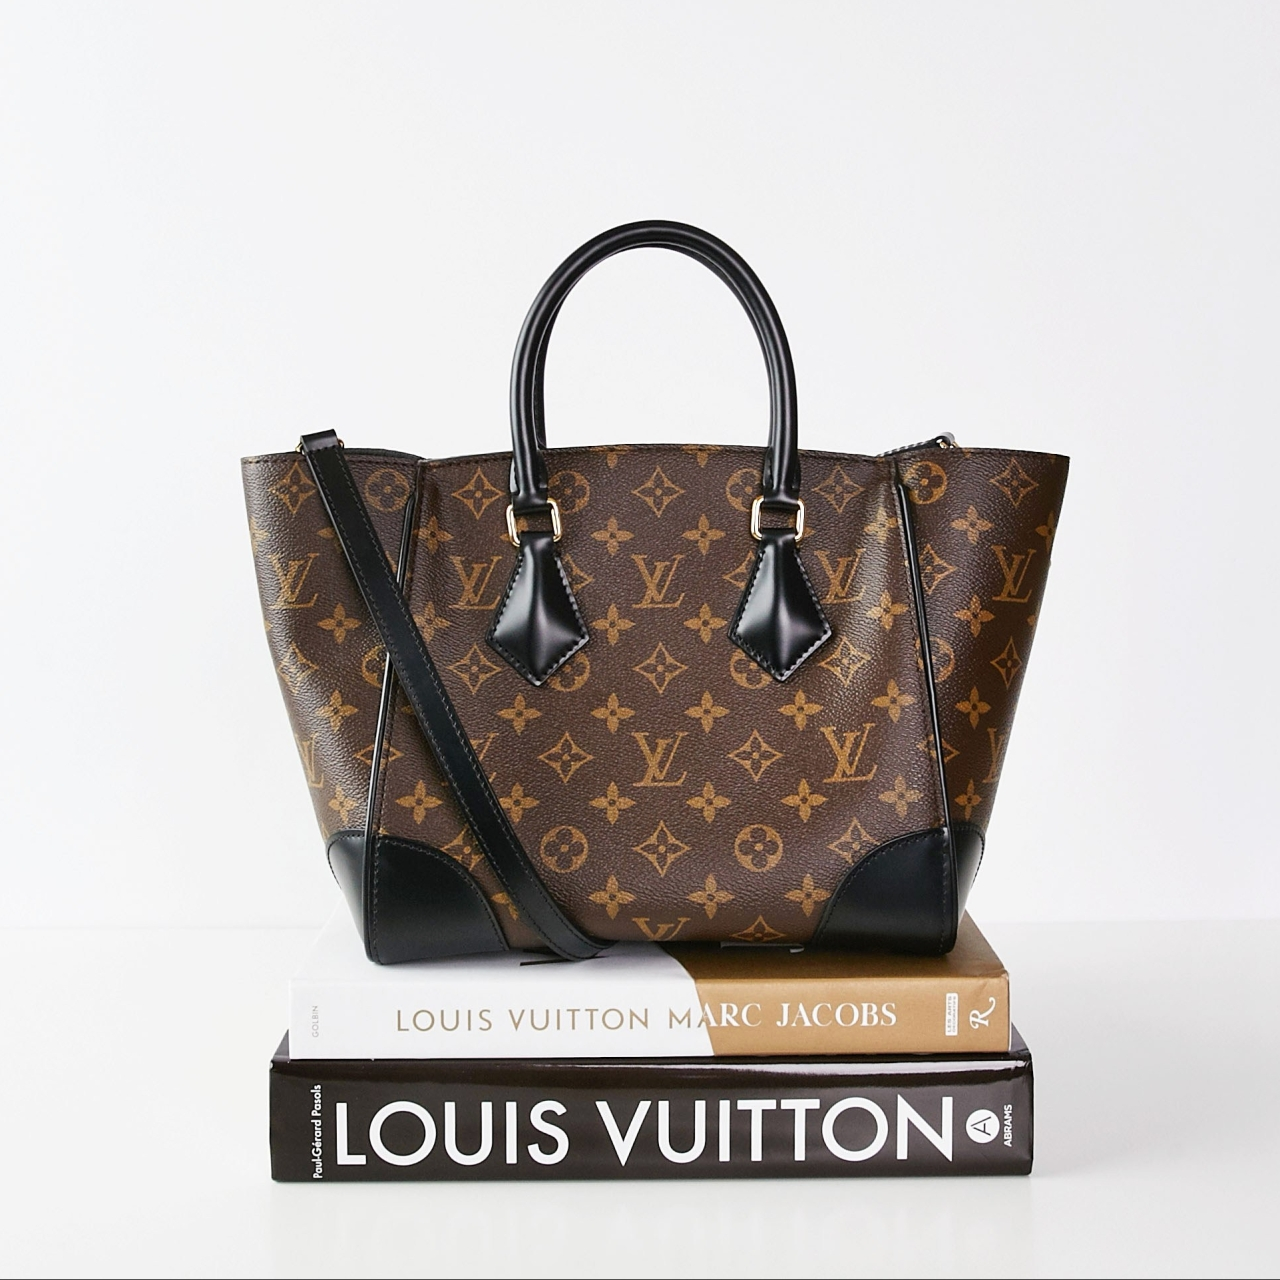 Louis Vuitton Phenix Bag